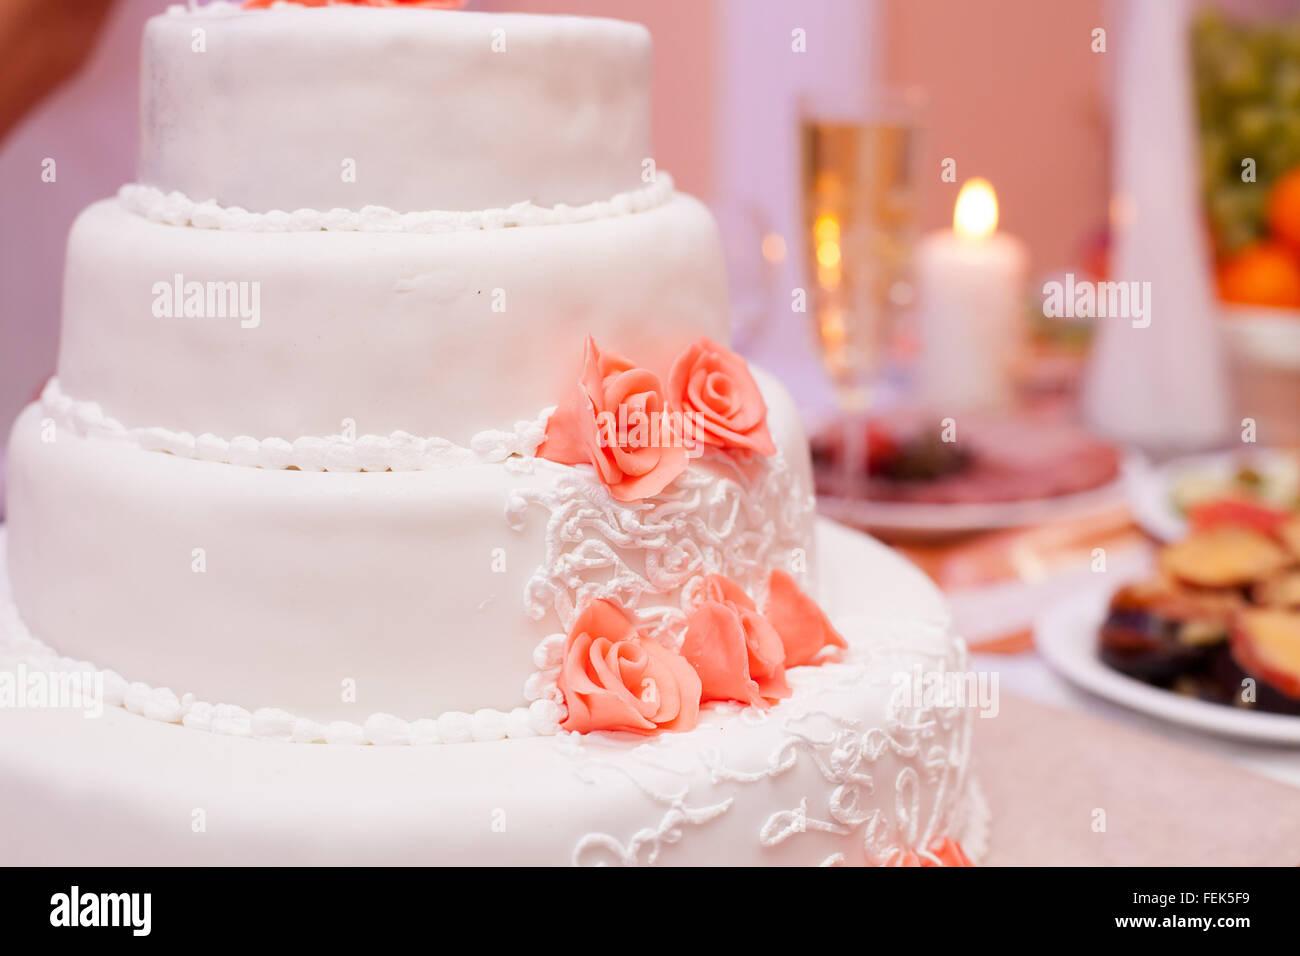 Details Wedding Cake White Sugar Stock Photos & Details Wedding Cake ...